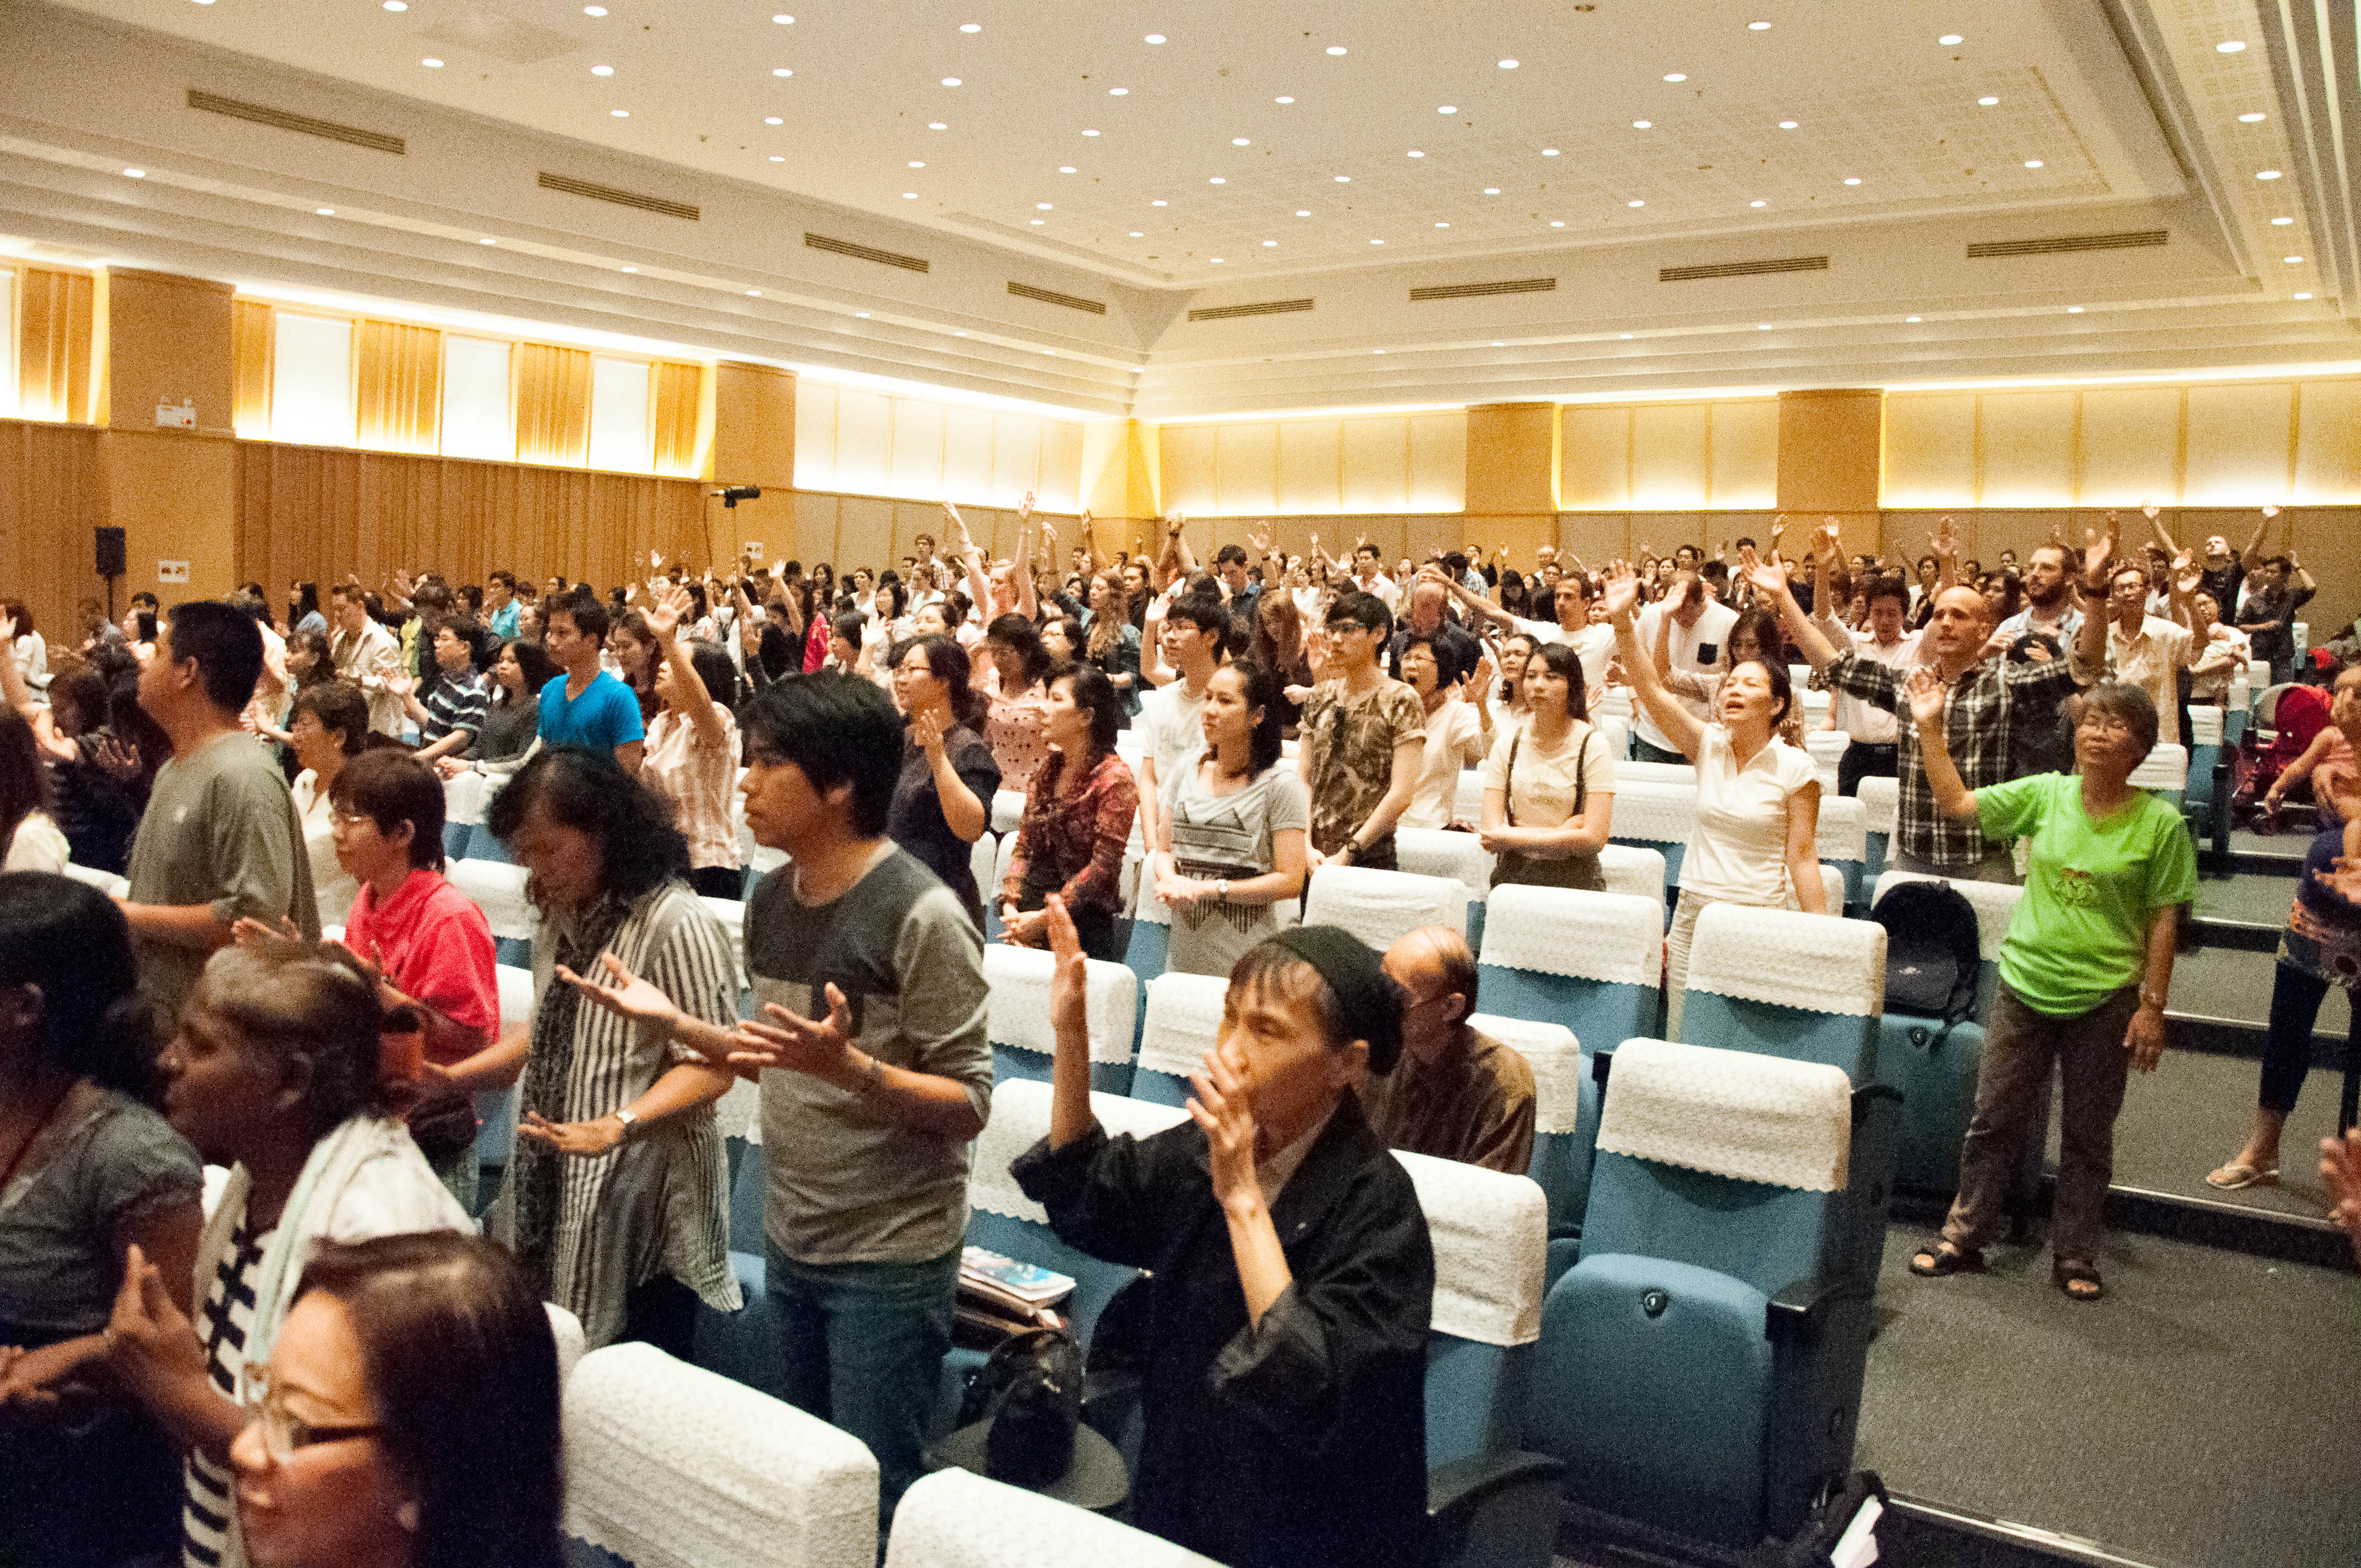 bangkok-thailand-ministry-october-2013-23